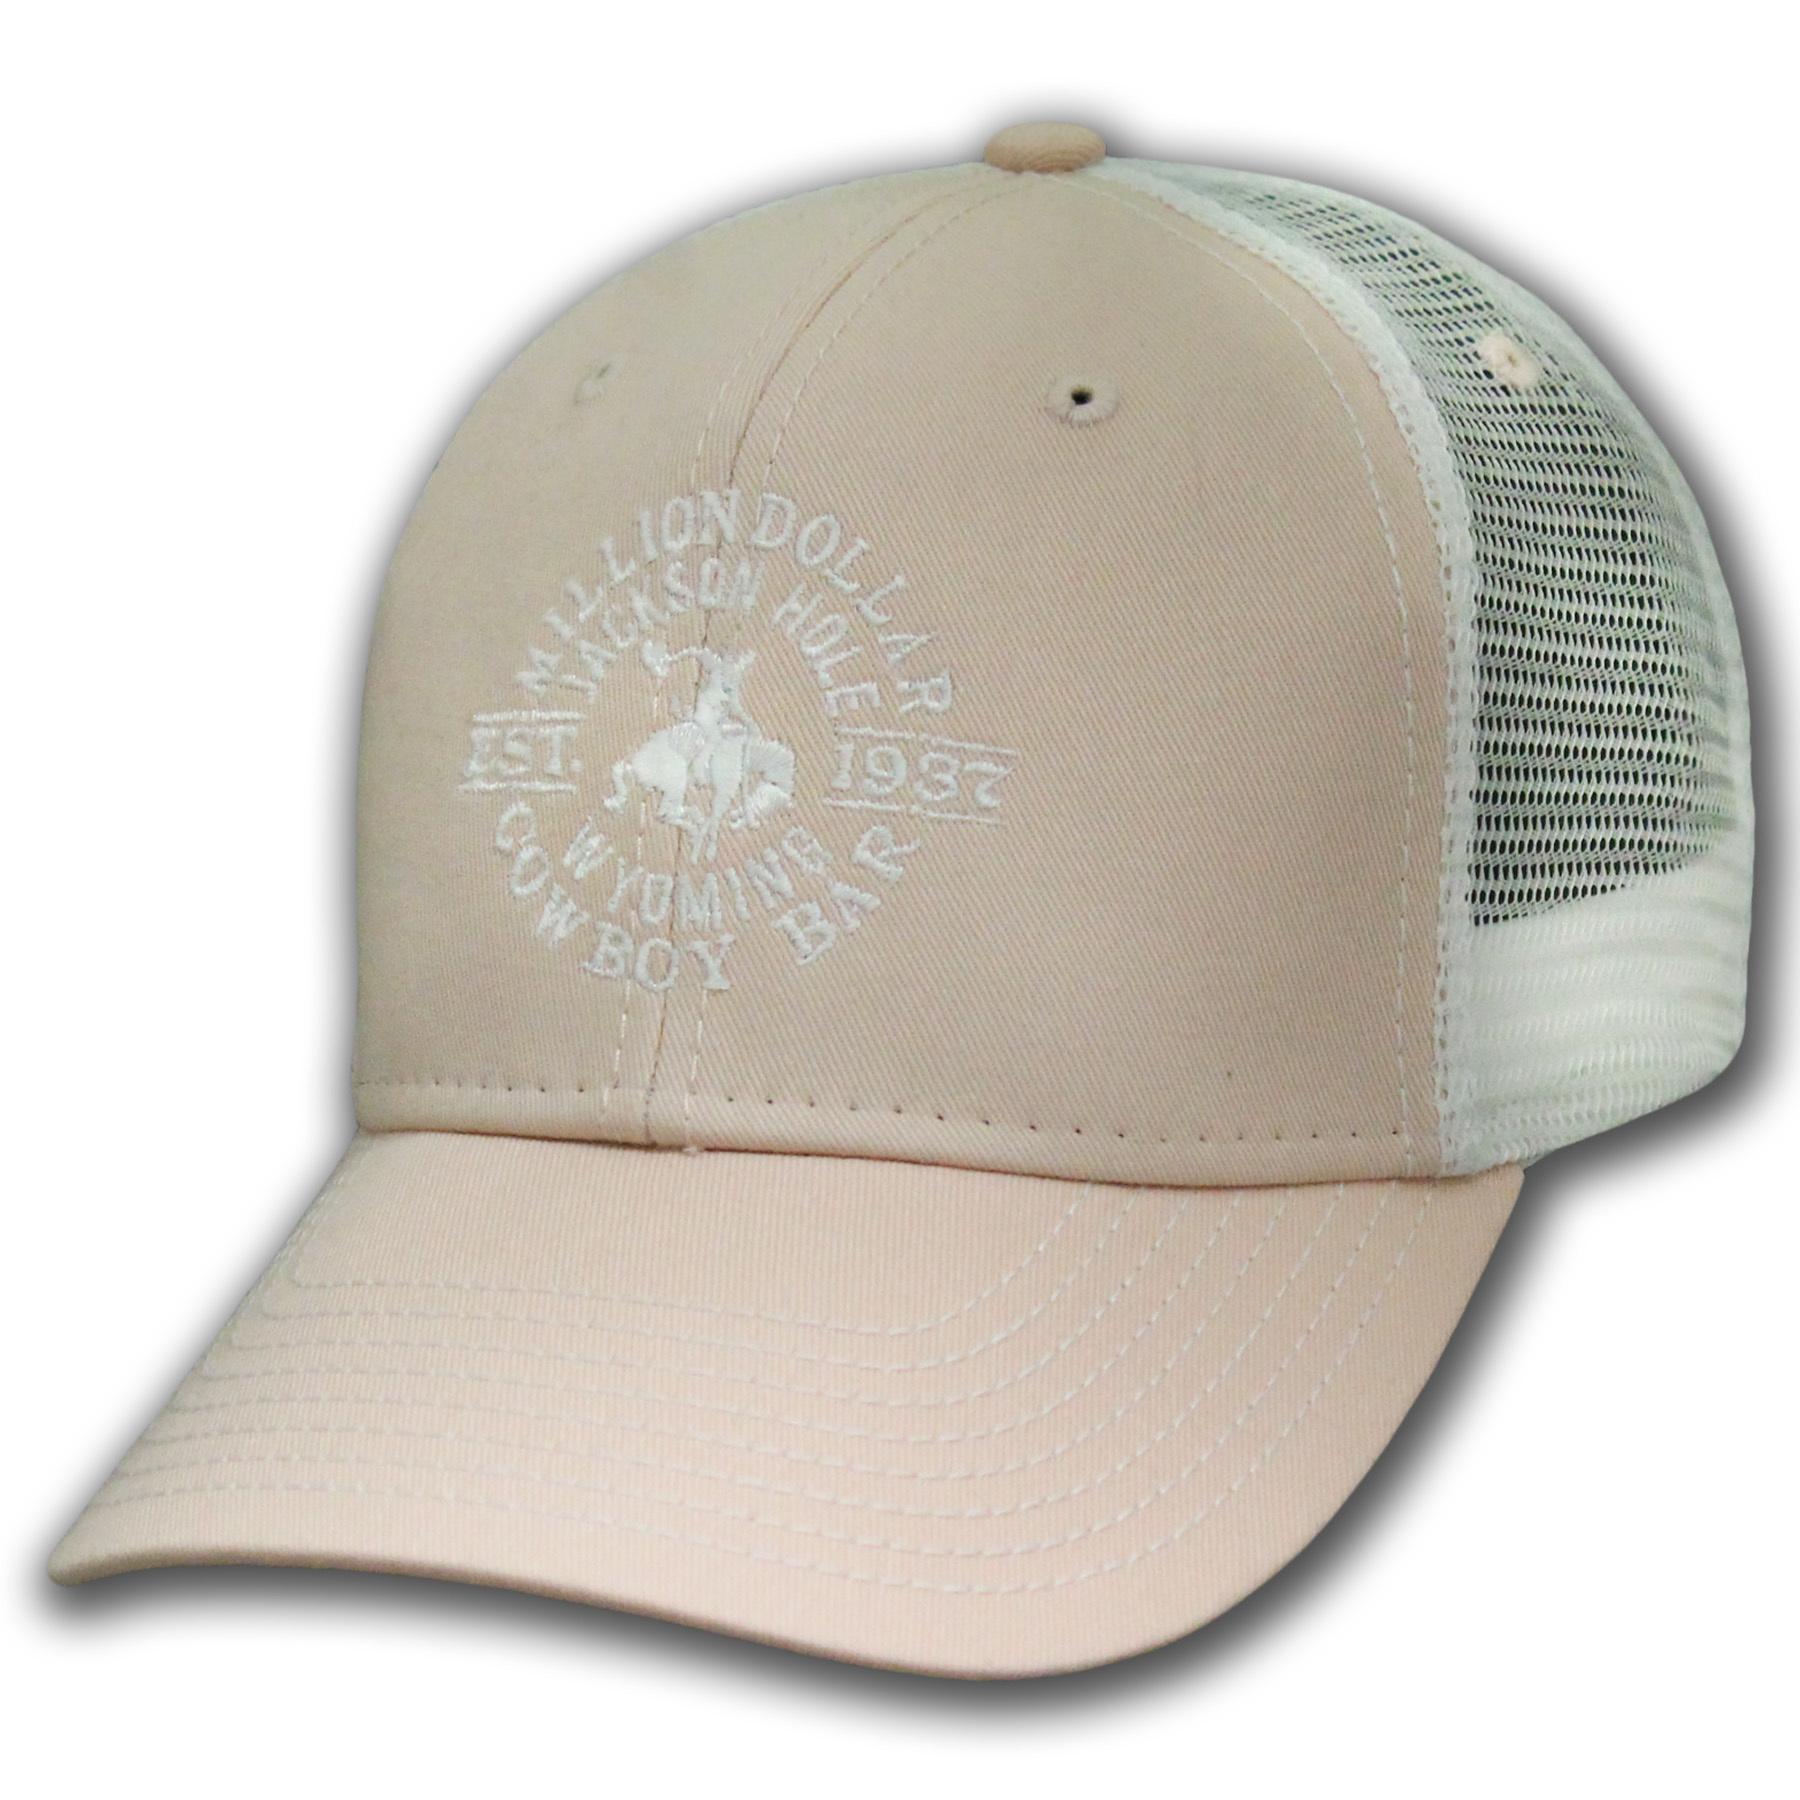 Women's Blush & White Mesh Cap